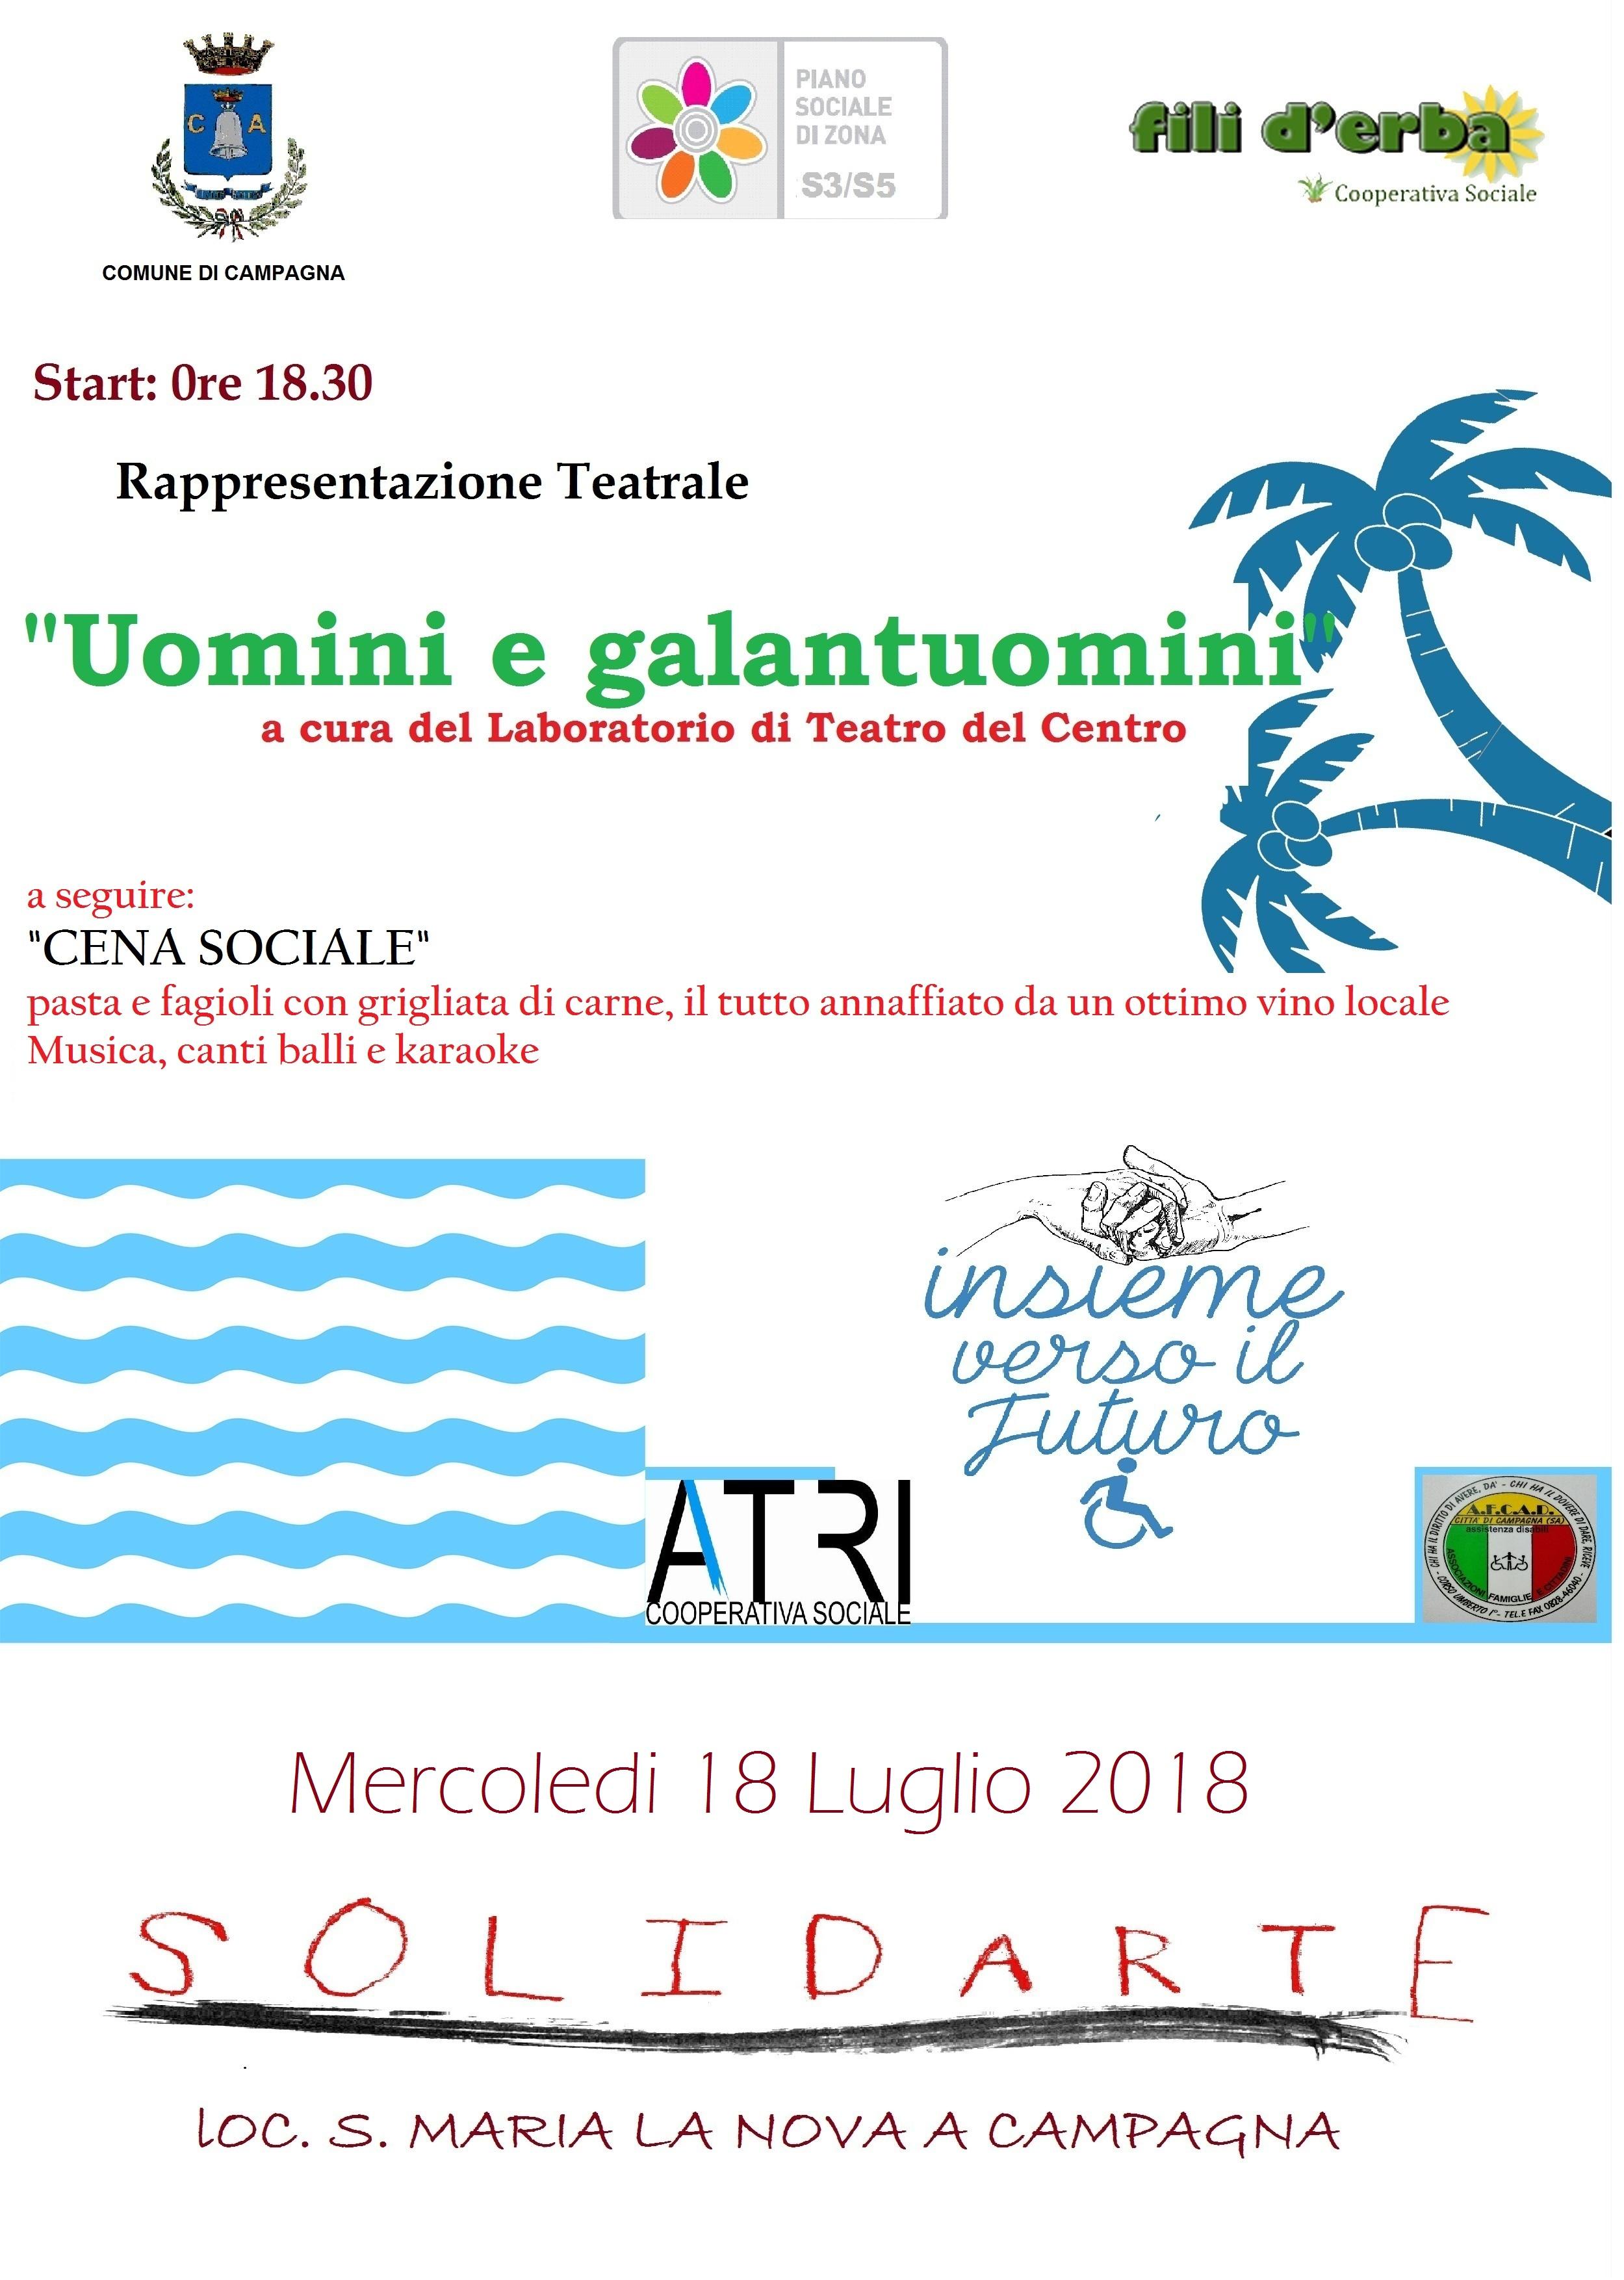 http://www.salernonotizie.net/wp-content/uploads/2018/07/Volantino_solidarte-2018.jpg